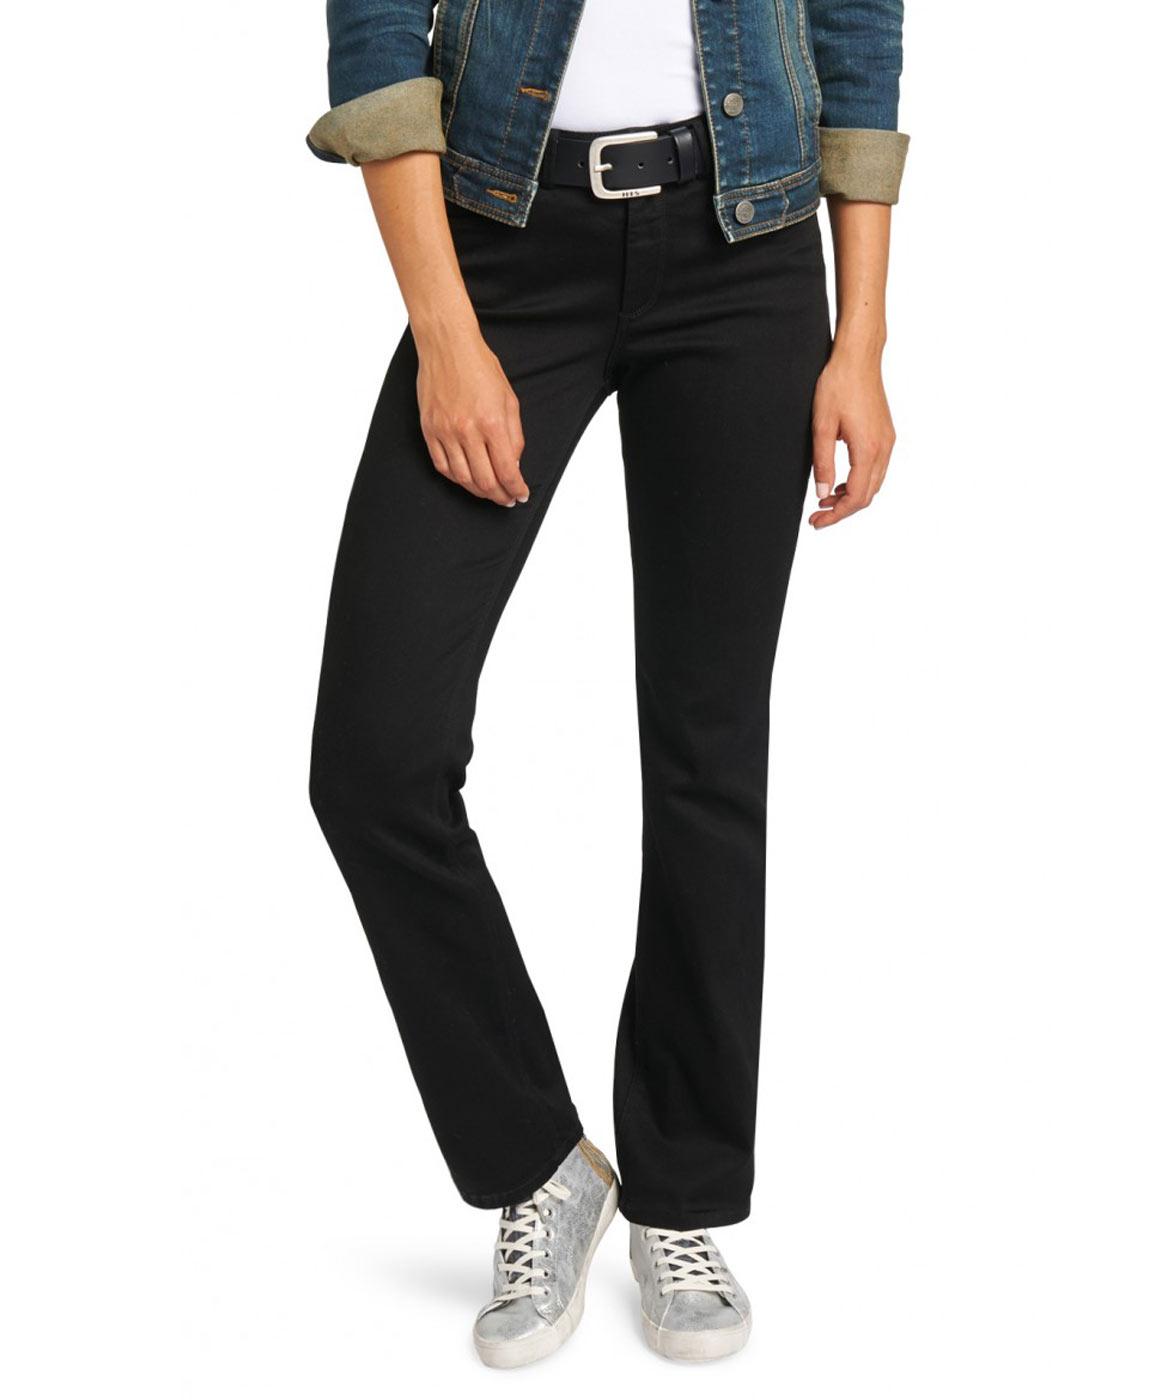 Hosen für Frauen - HIS COLETTA Jeans Comfort Fit Deep Black  - Onlineshop Jeans Meile